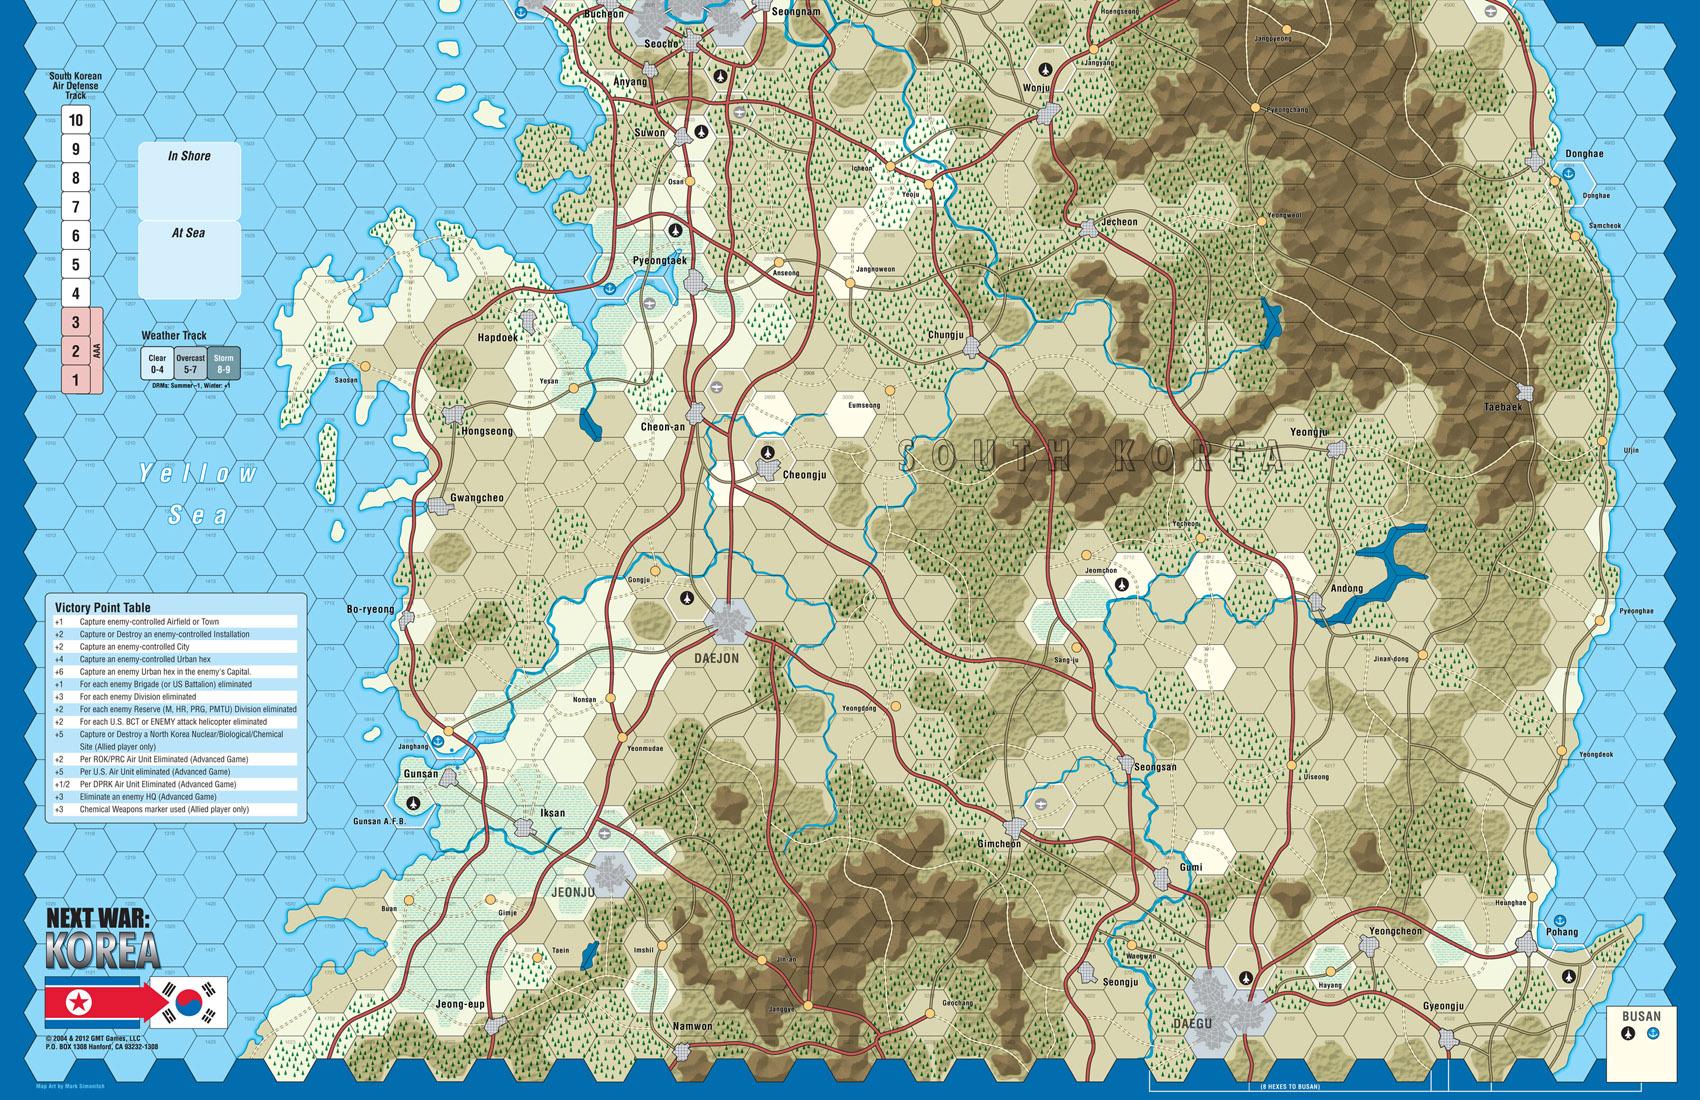 Gmt games next war korea reprint ed vassal near final south map gumiabroncs Image collections